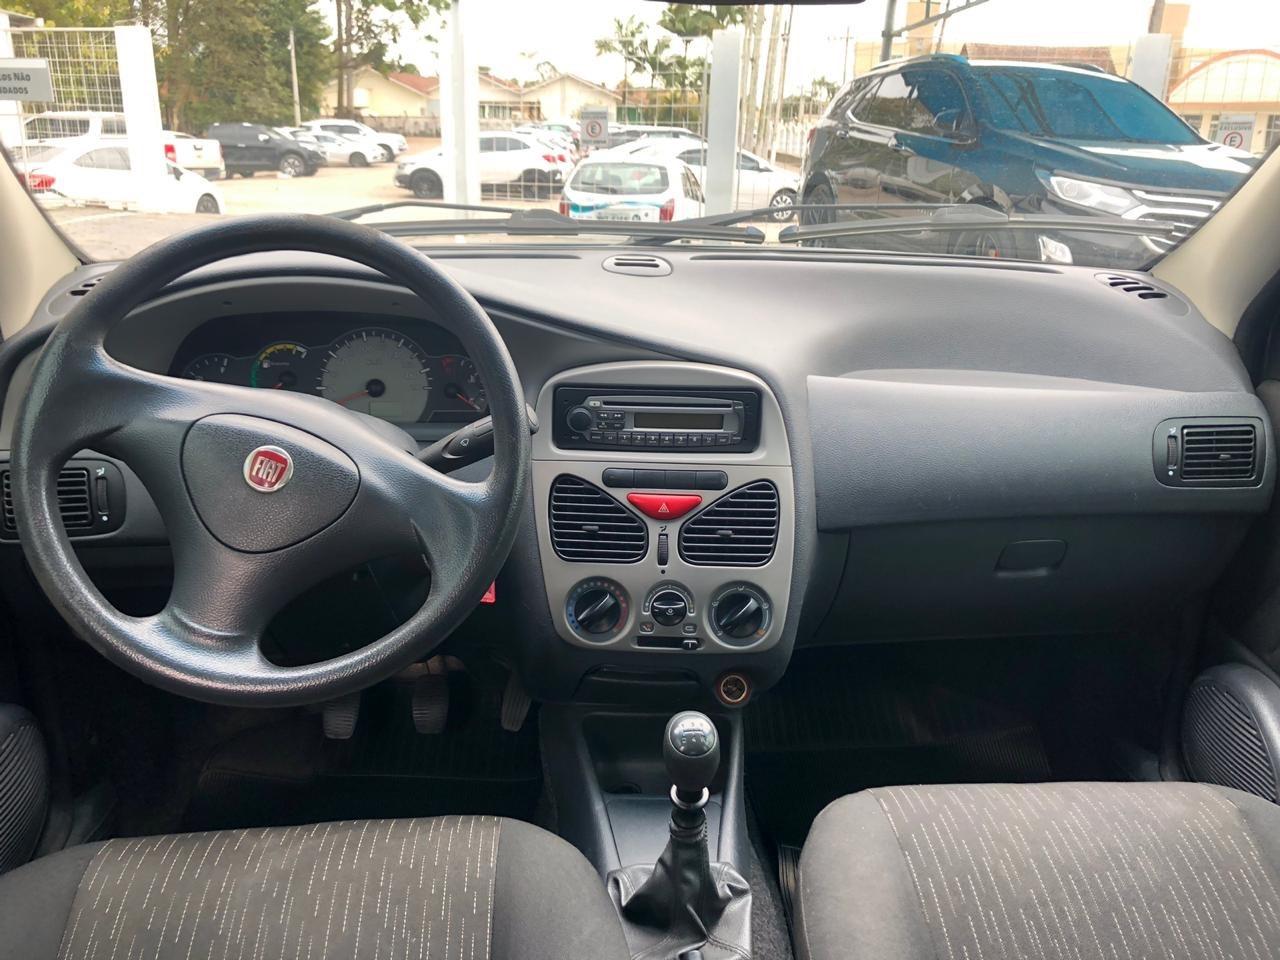 Fiat Palio ECONOMY 1.0L 2013